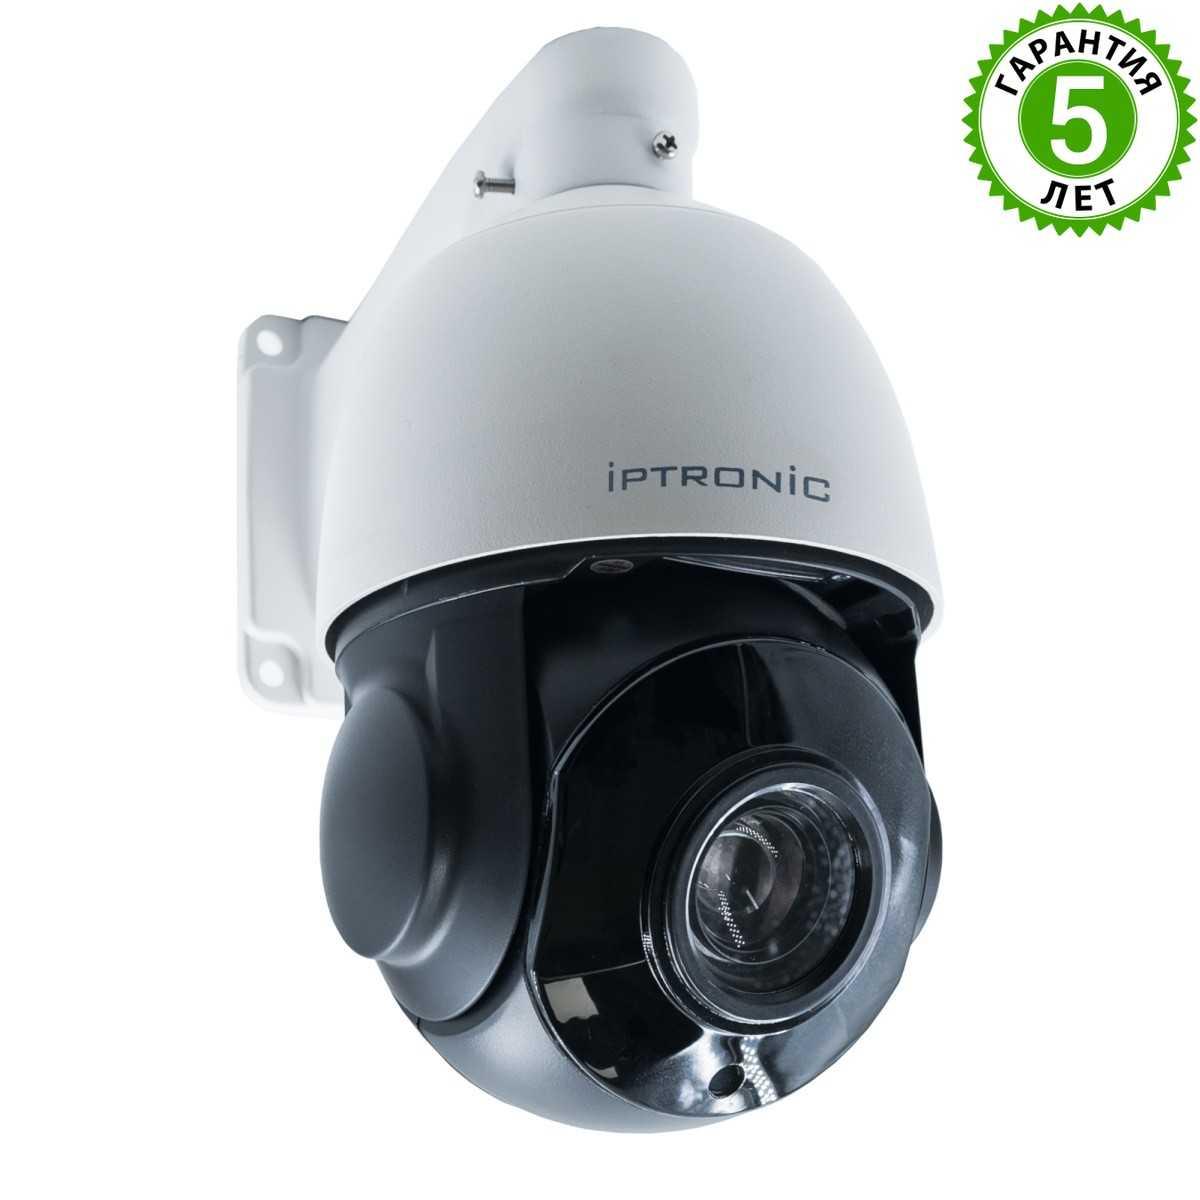 Видеокамера IPTRONIC IP5MS200(22X) IR60P